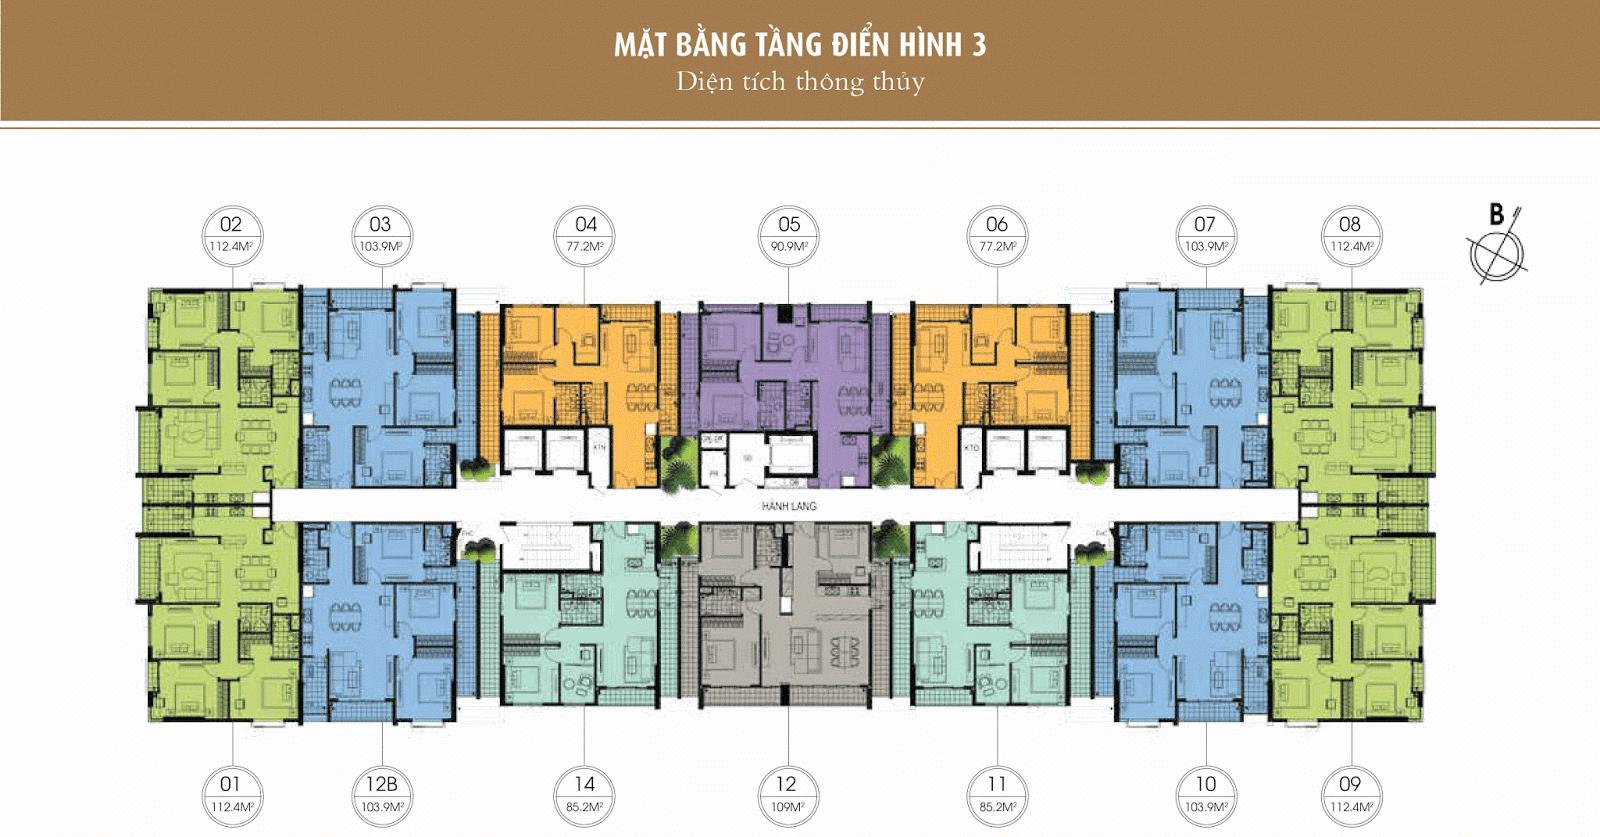 Mặt bằng thiết kế tầng 3 - One 18